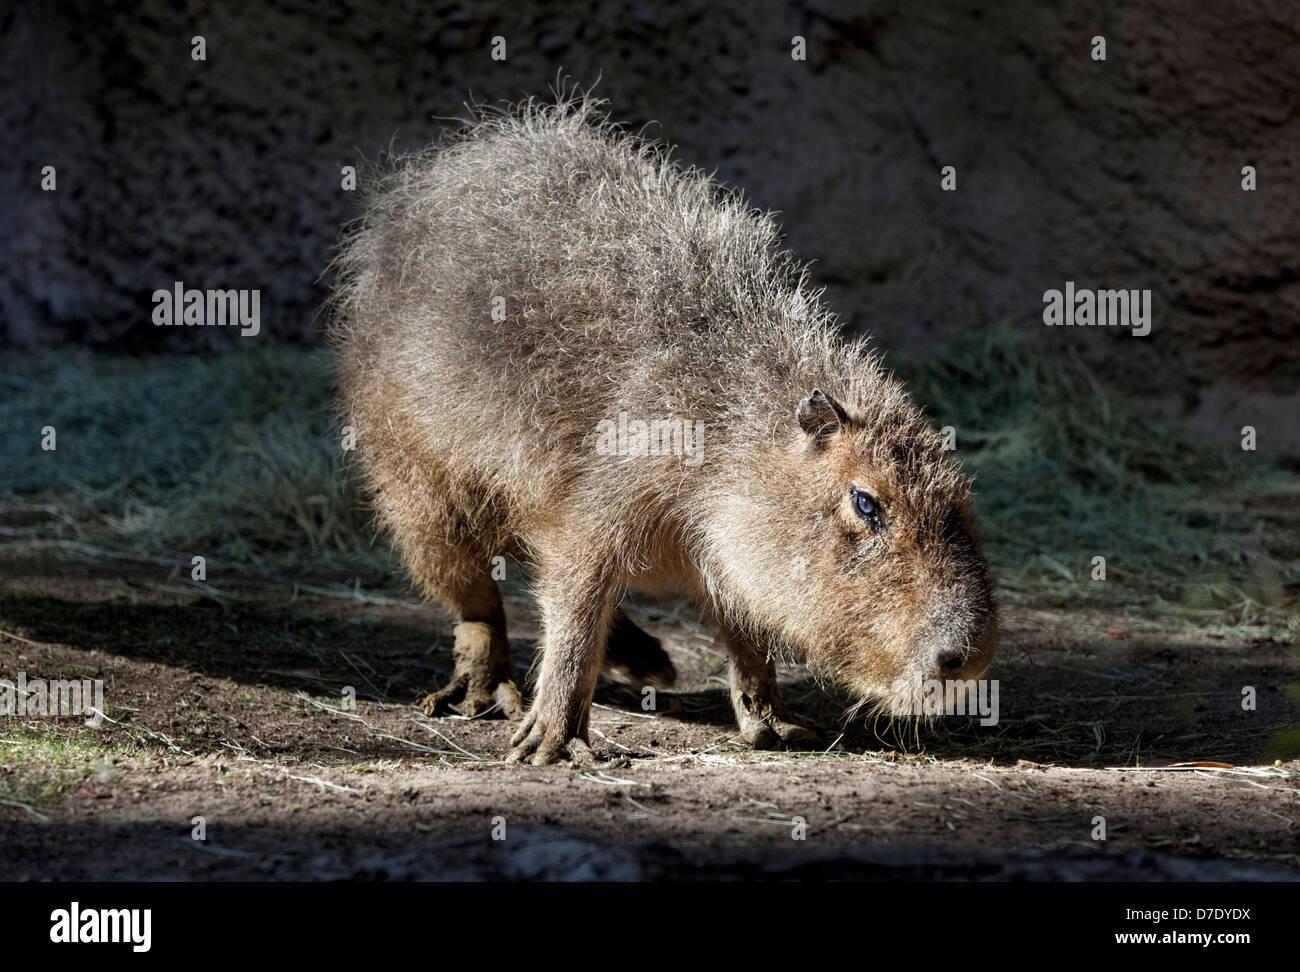 Capybara (Hydrochoerus hydrochaeris) - The largest rodent in the world - Stock Image